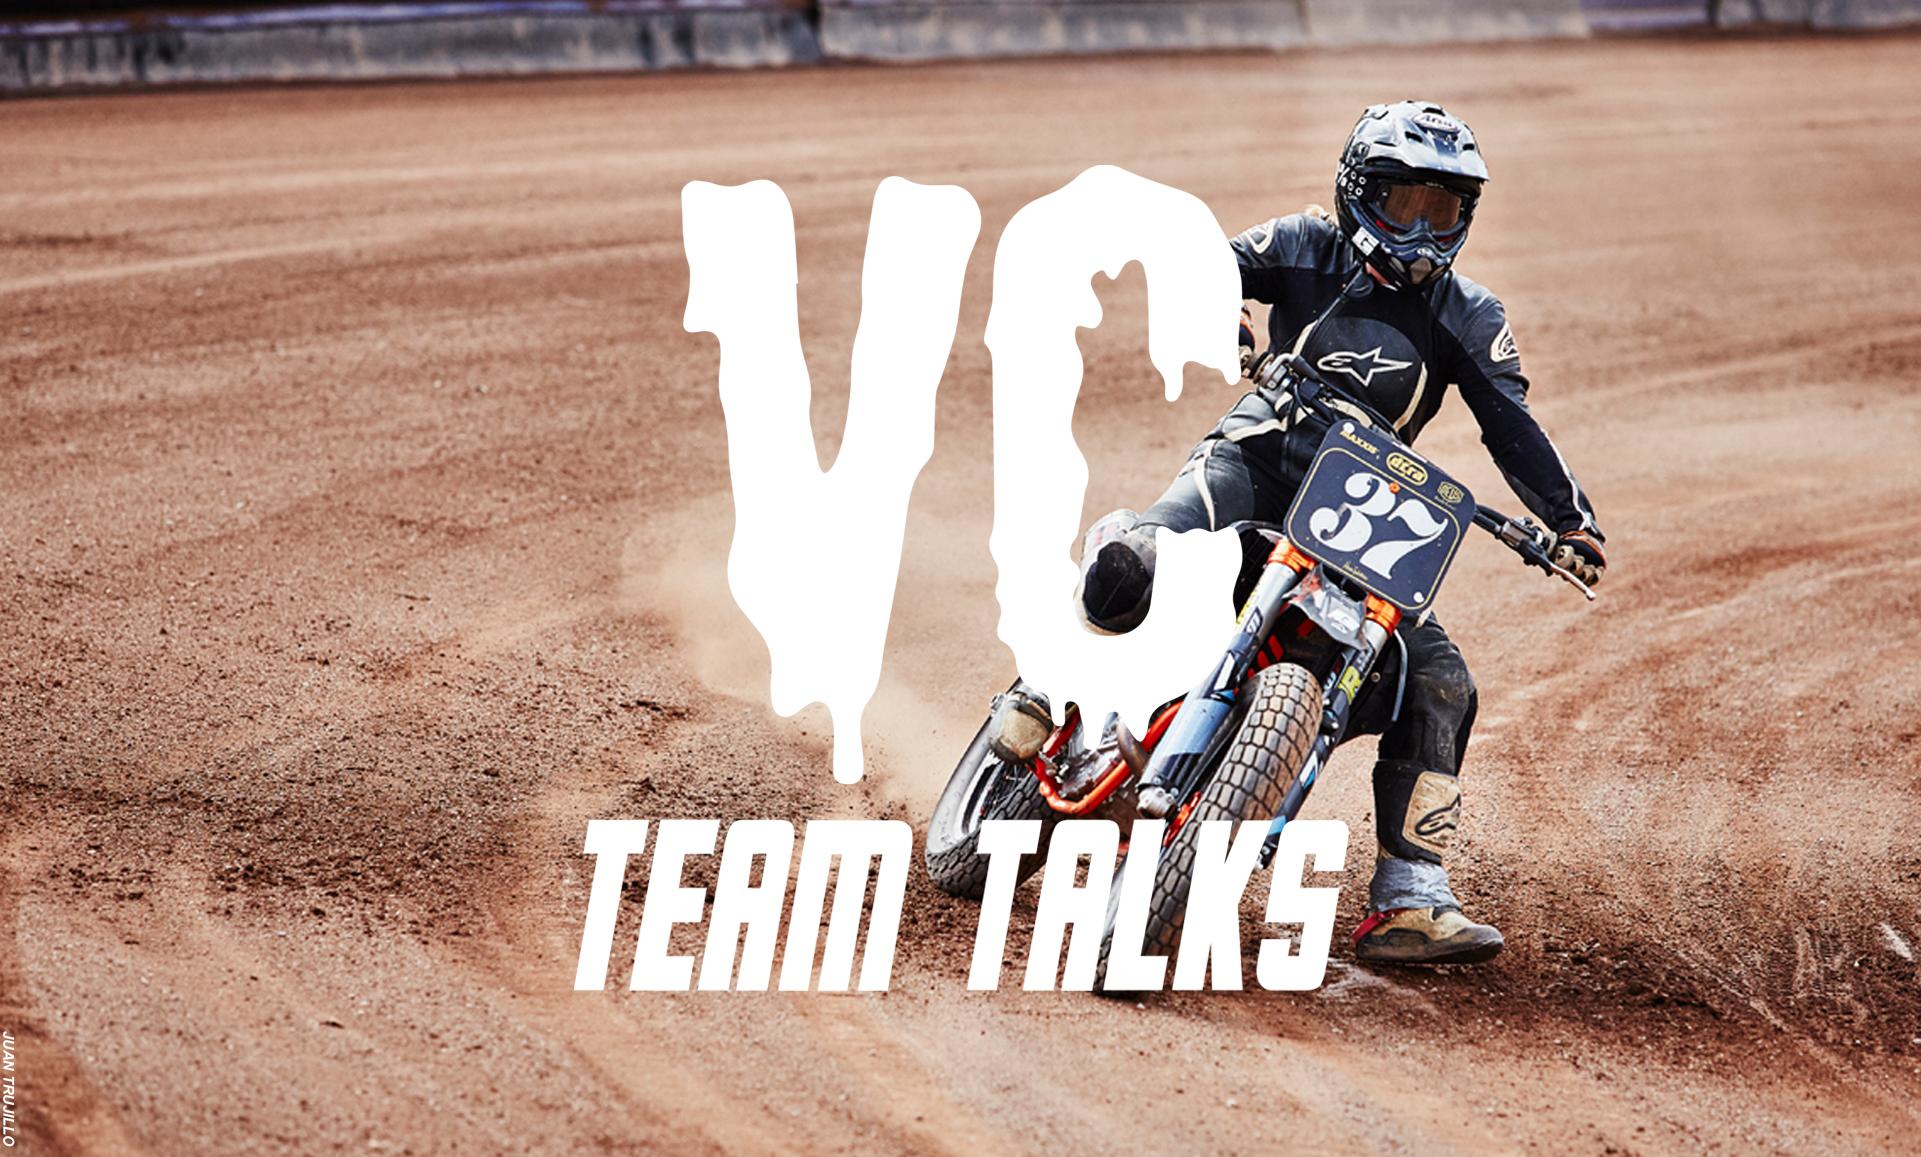 vc+team+talks+LEAH+TOKELOVE-1.jpg